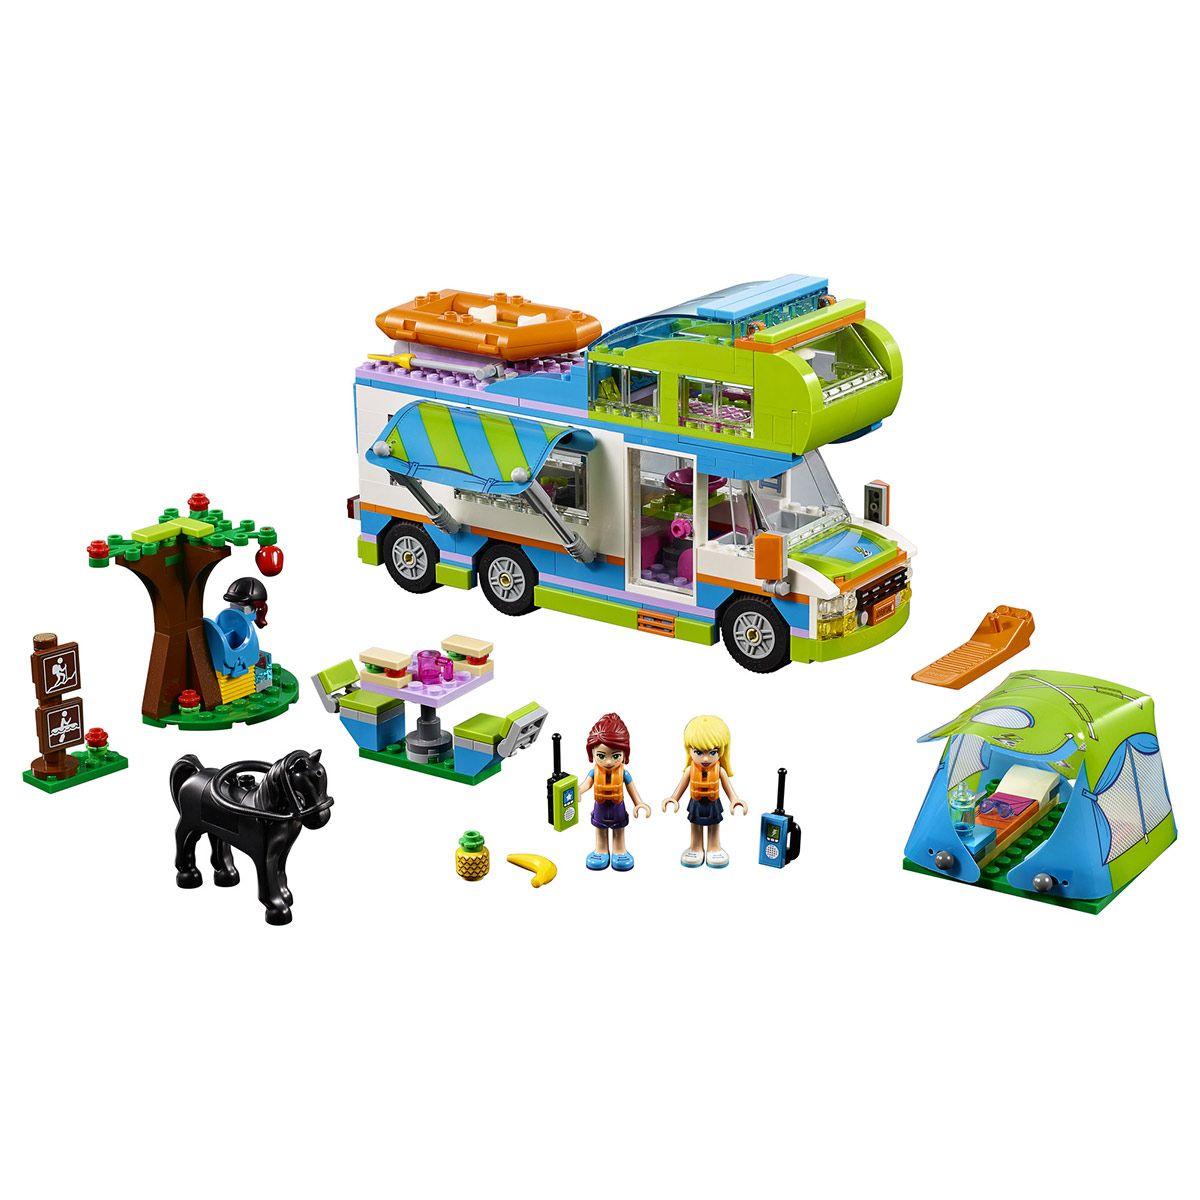 Camping De Et Friends Lego Le Car 41339 Sport La Aventures Mia eEDW29YHI